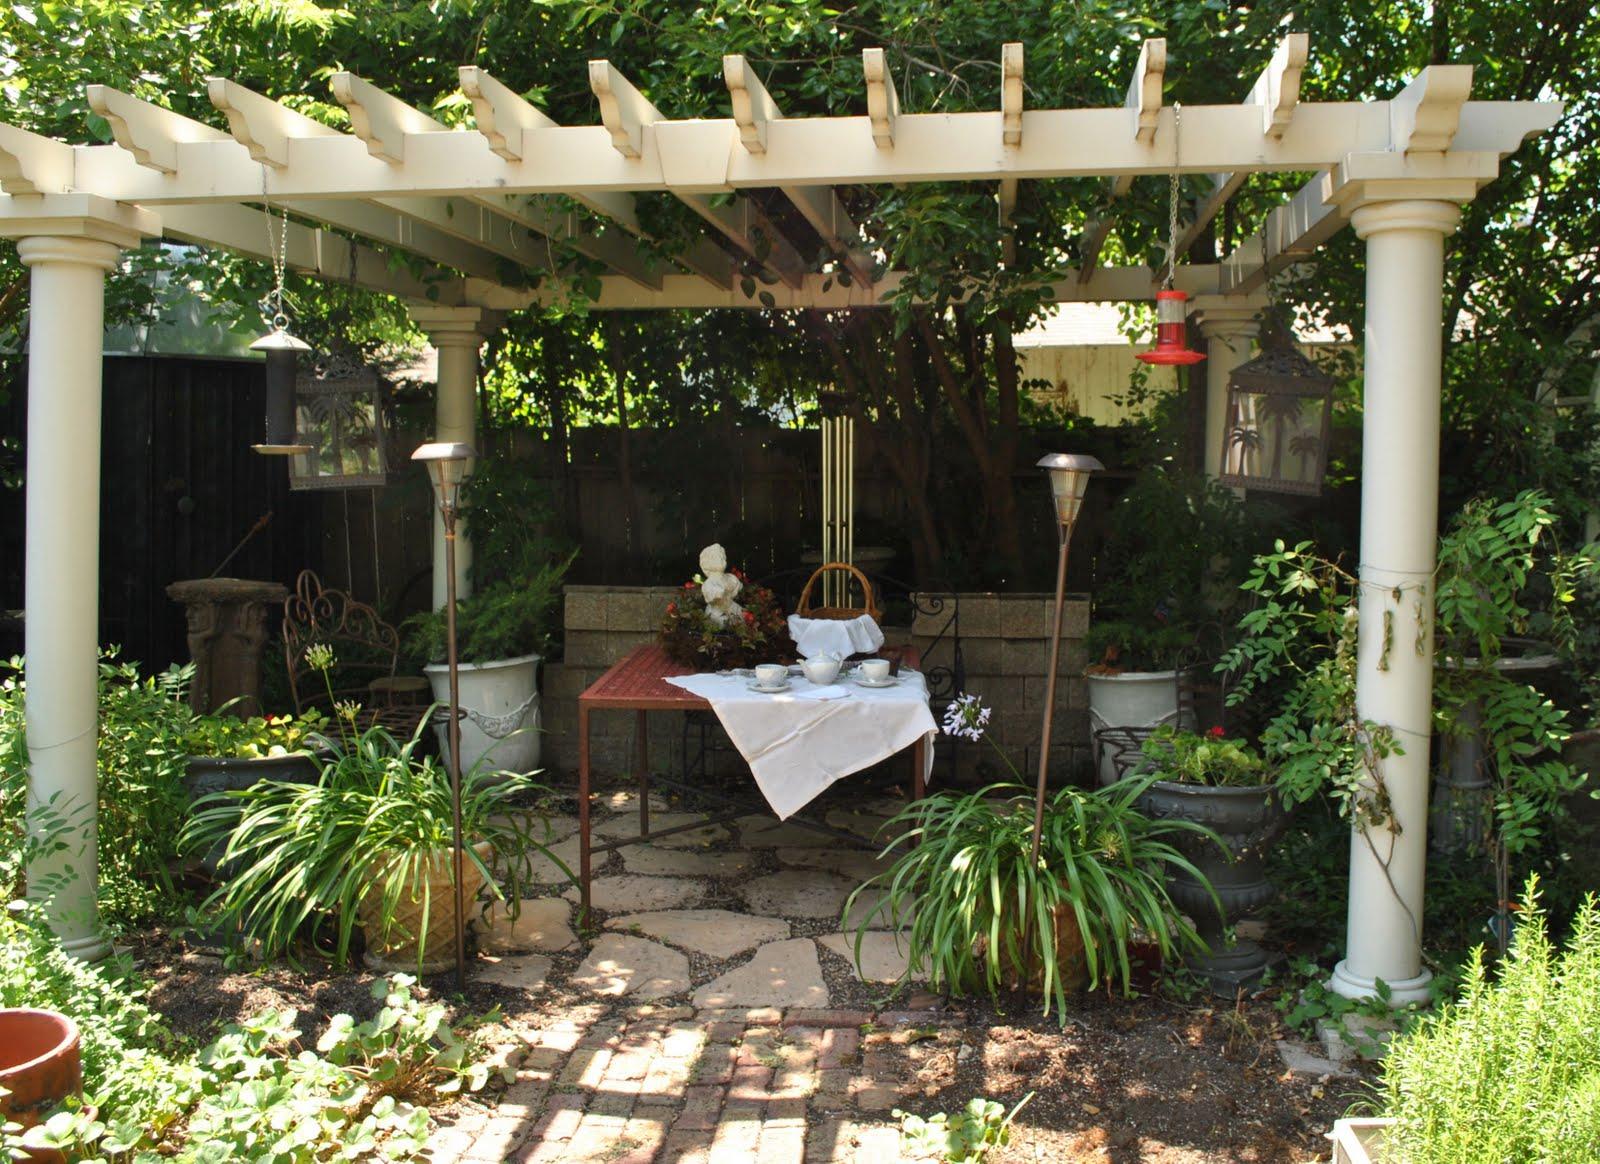 Simphome.com 20 pergola design ideas turn your garden into a peaceful refuge